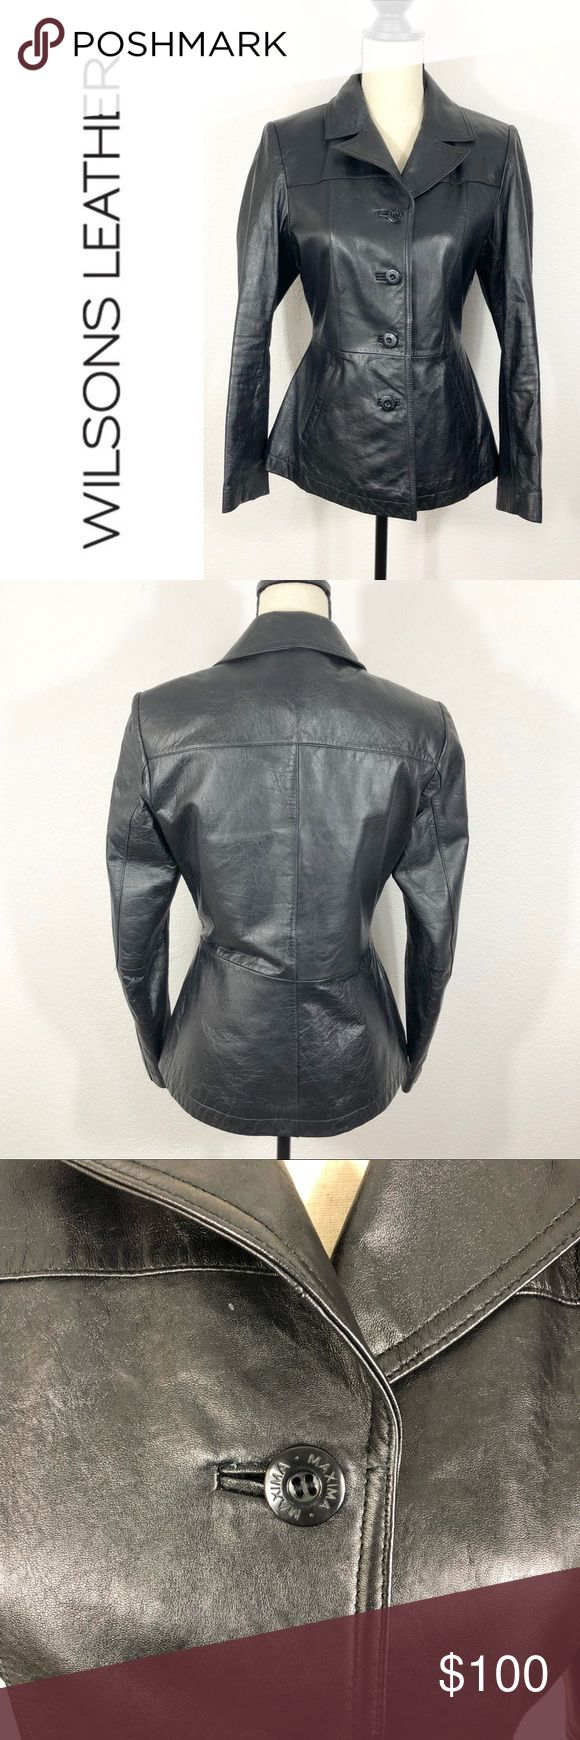 Wilsons Leather Maxima Leather Jacket Black Small EUC